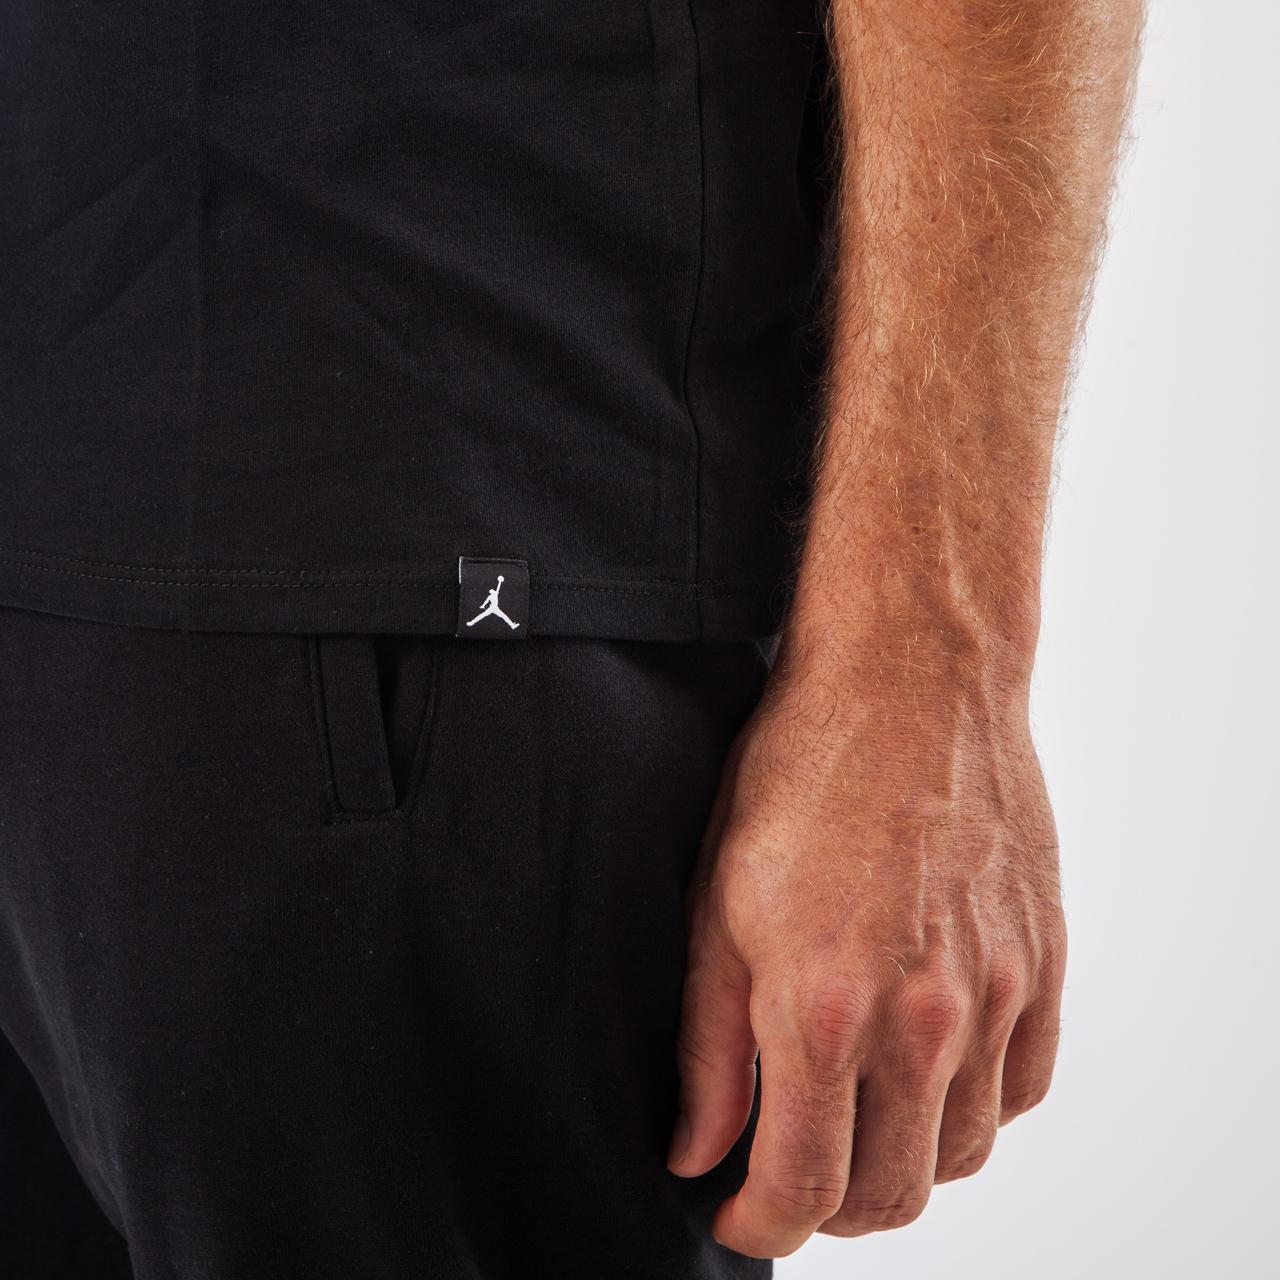 410b500d2ae Lyst - Nike Nike Air Jordan Sportswear Graphic T-shirt in Black for Men